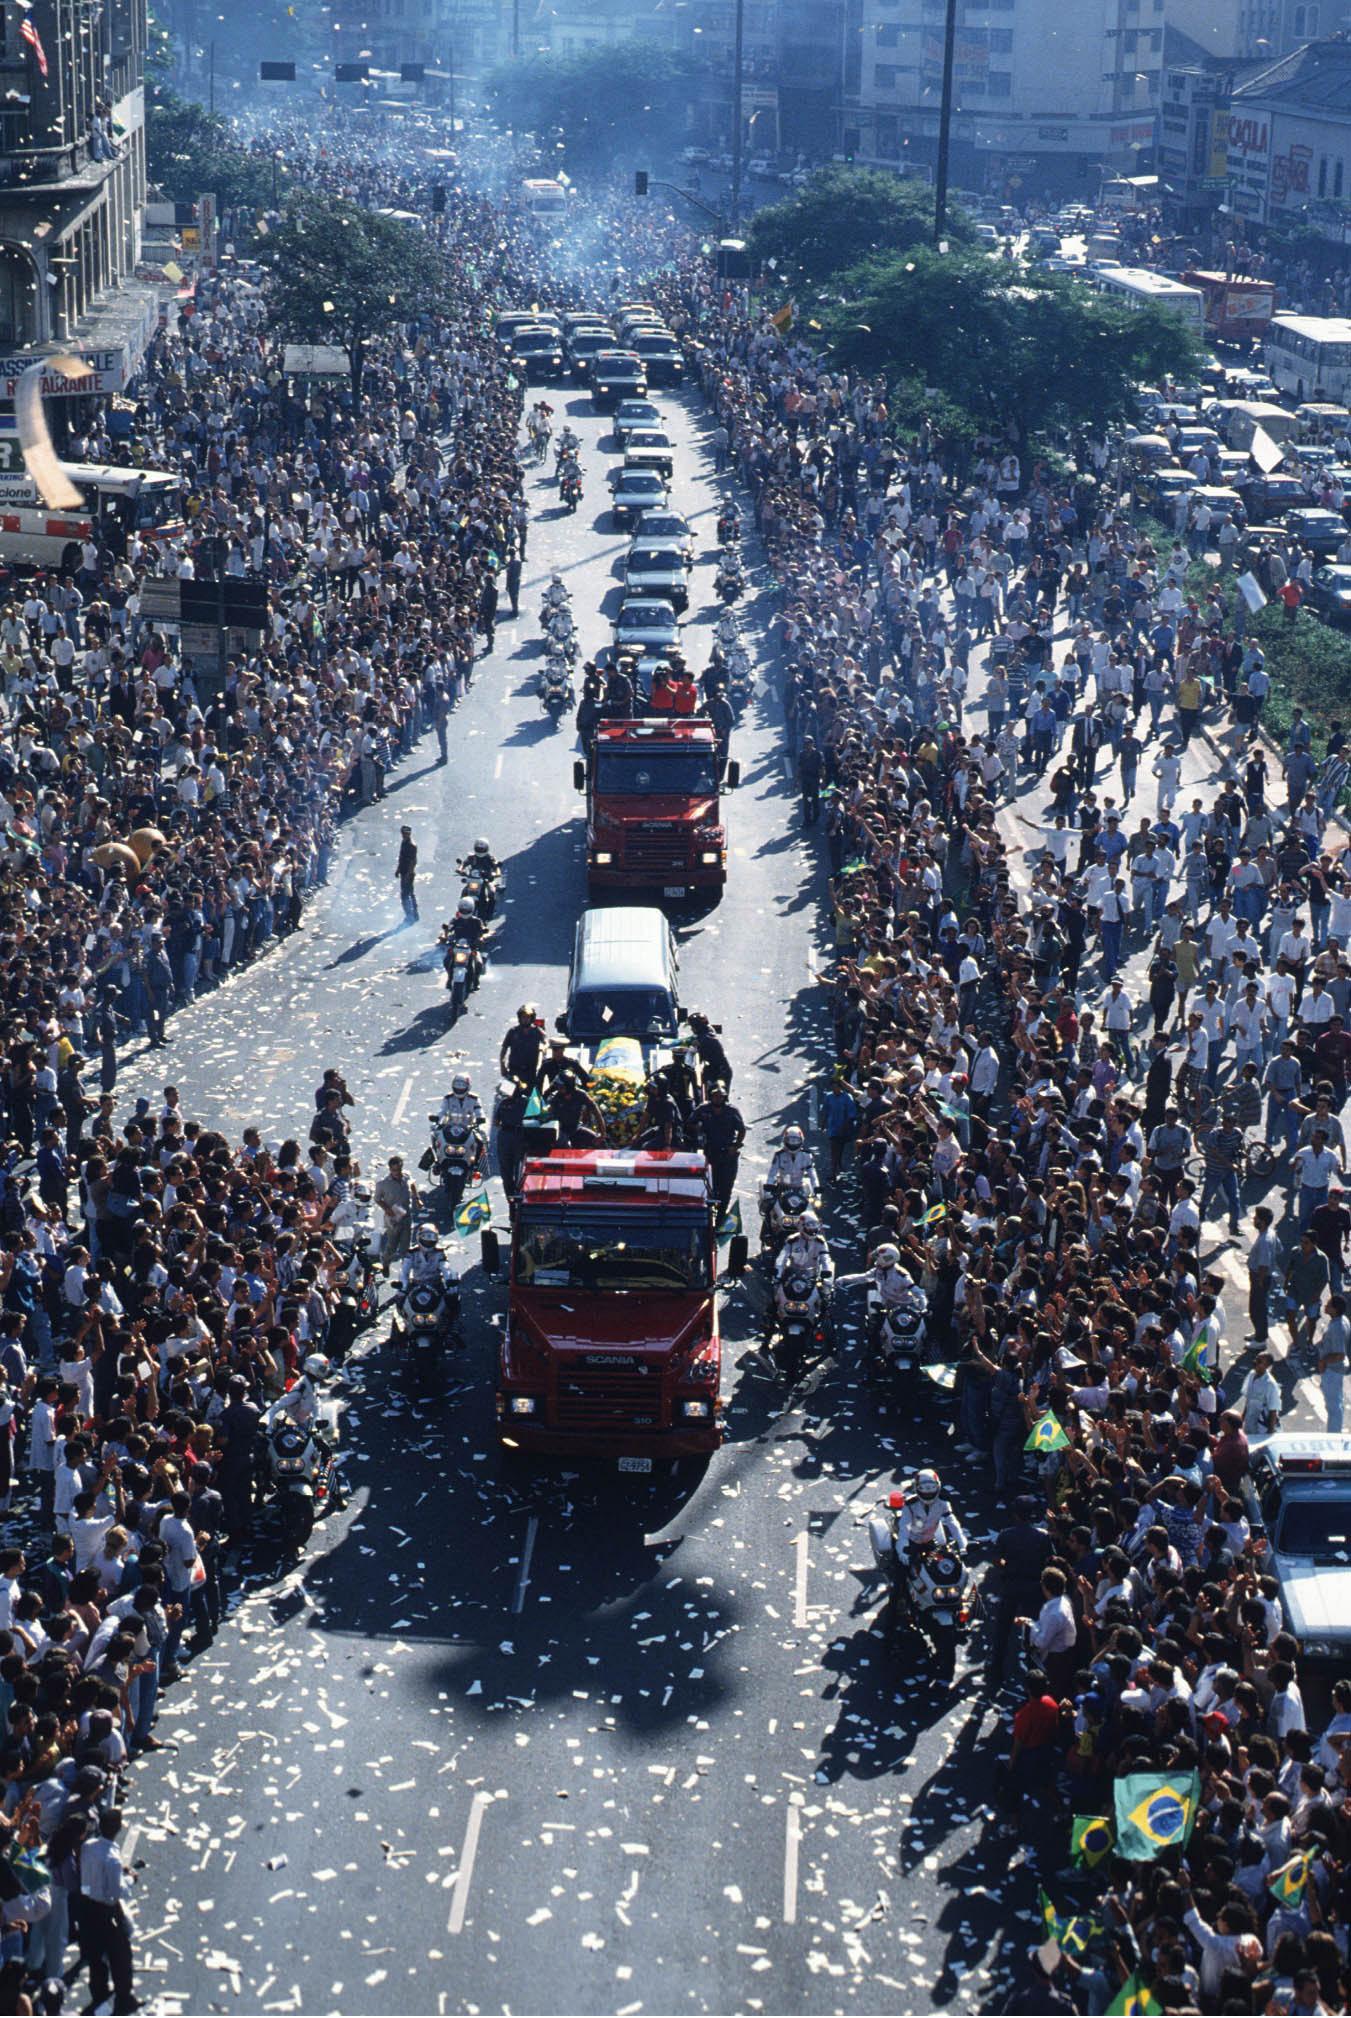 Huge-crowds-line-the-route-of-Ayrton-Sennas-funeral-cortege